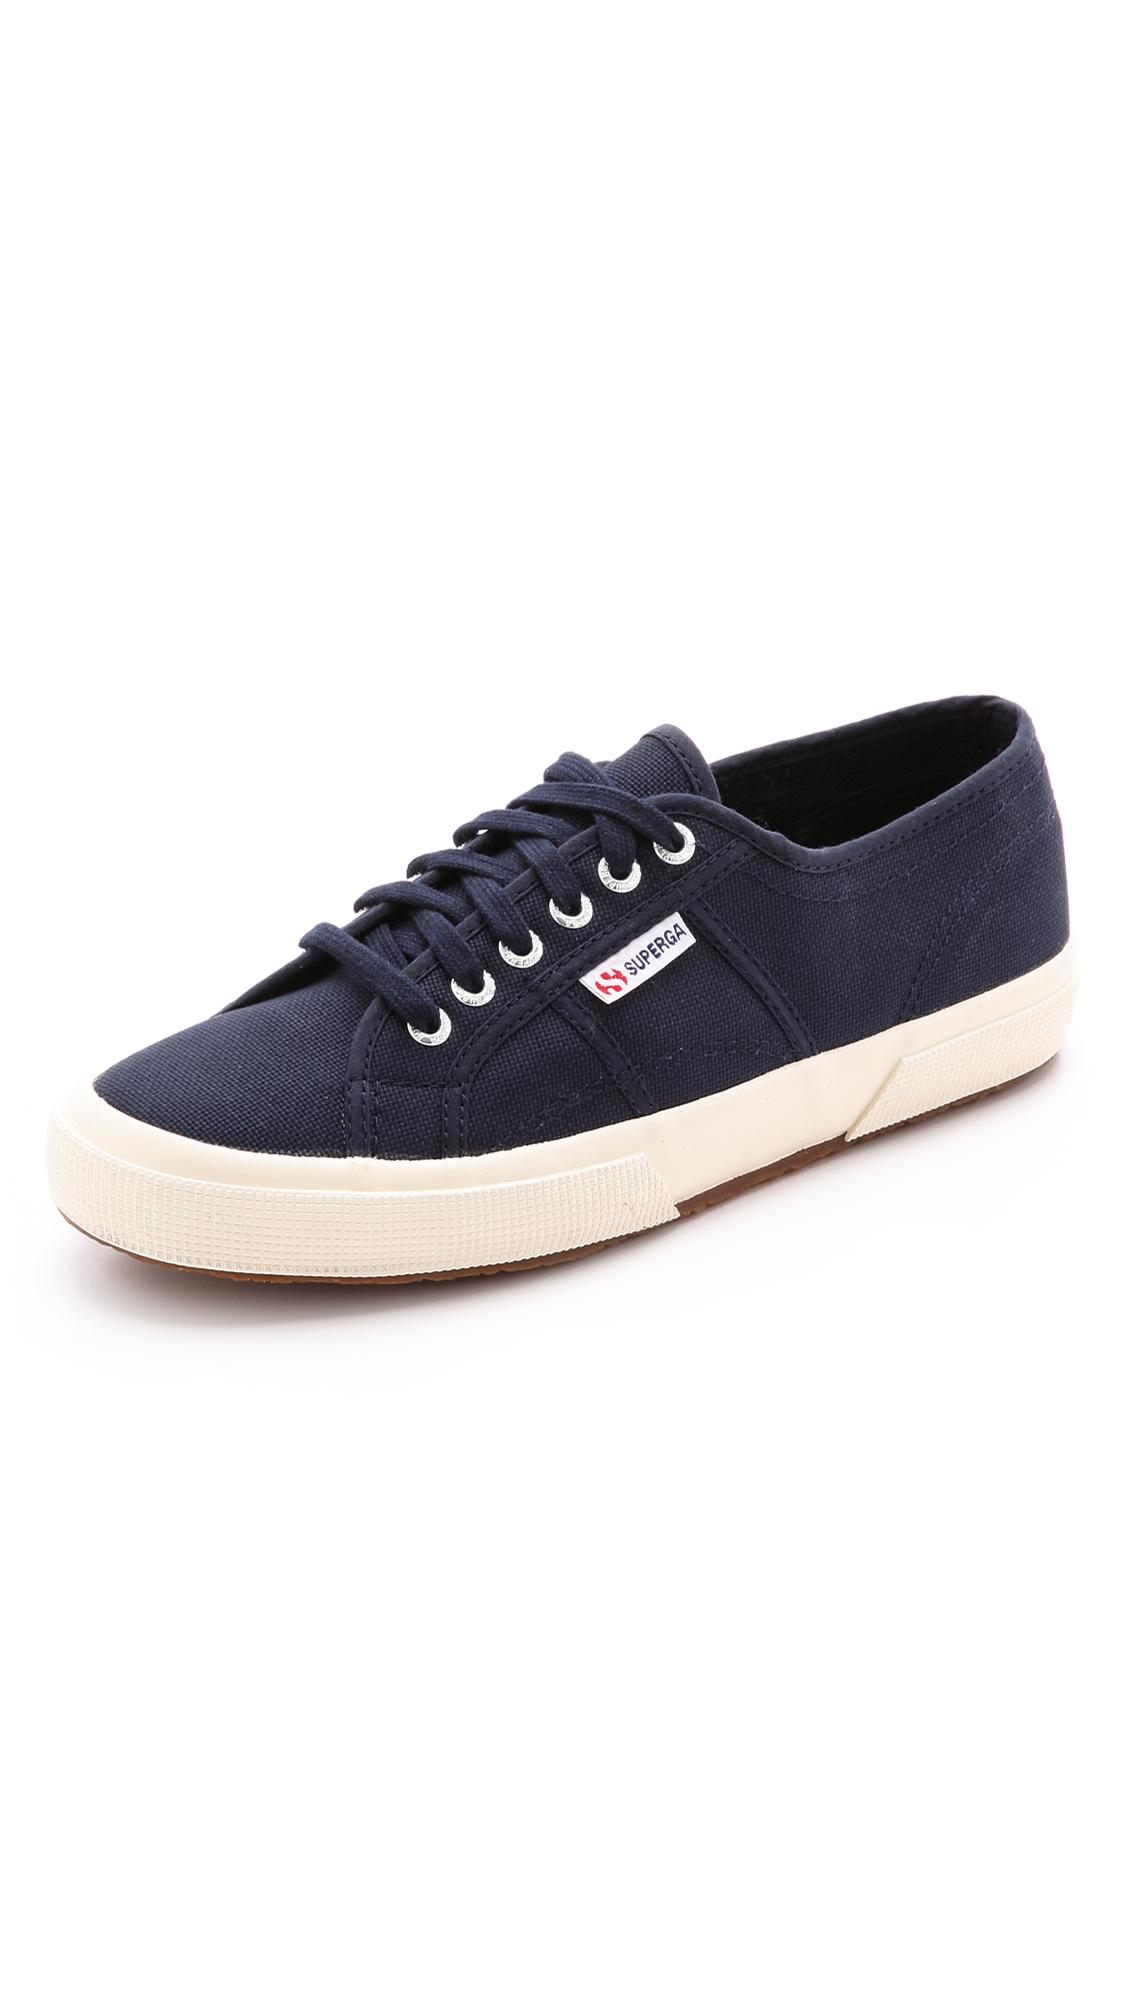 721645e3544742 Superga 2750 Cotu Classic Sneakers